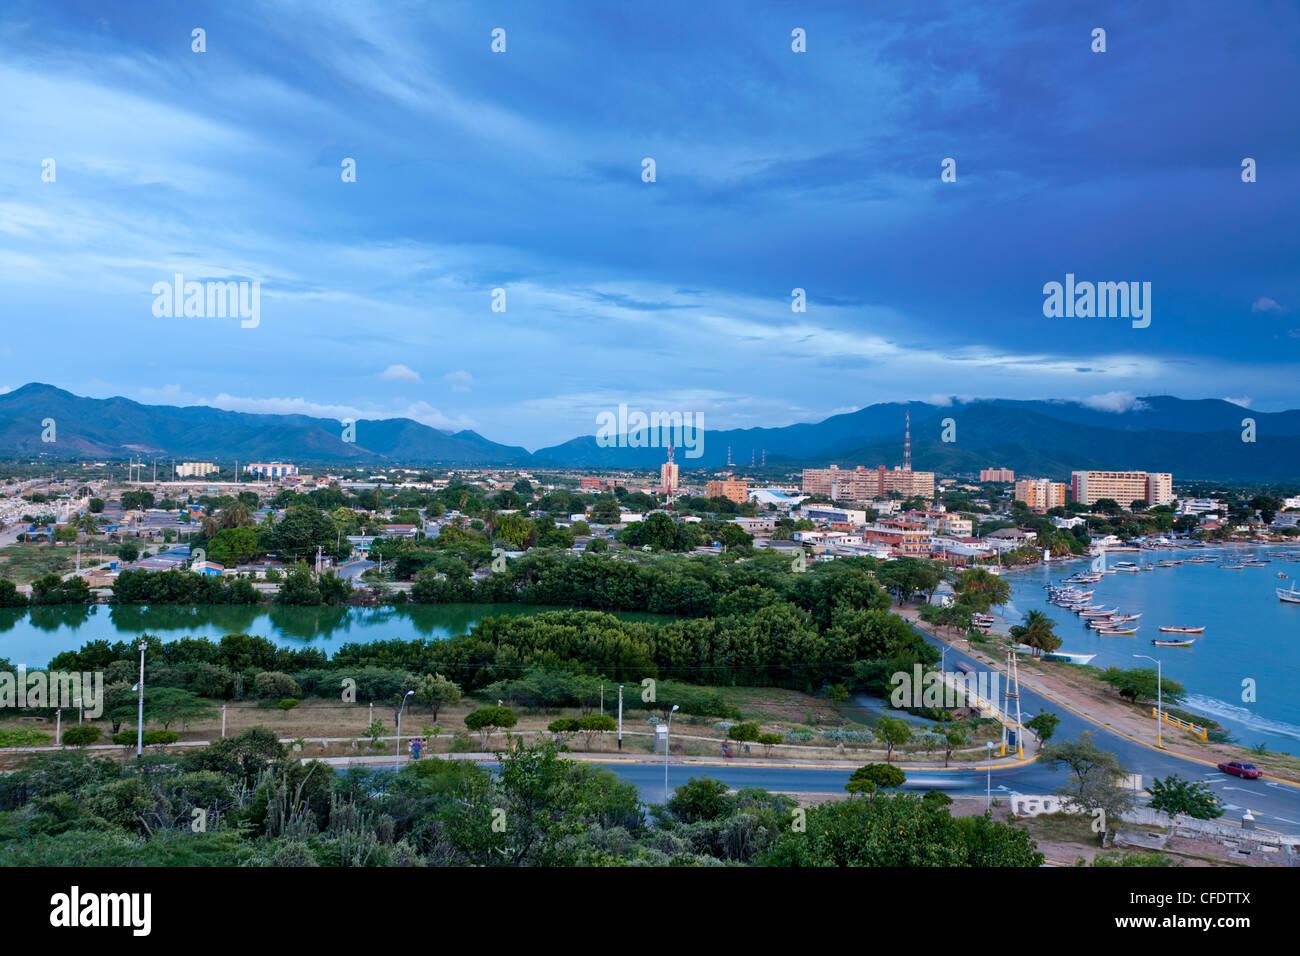 View of Juangriego, Isla De Margarita (Margarita Island), Nueva Esparta, Venezuela, South America - Stock Image